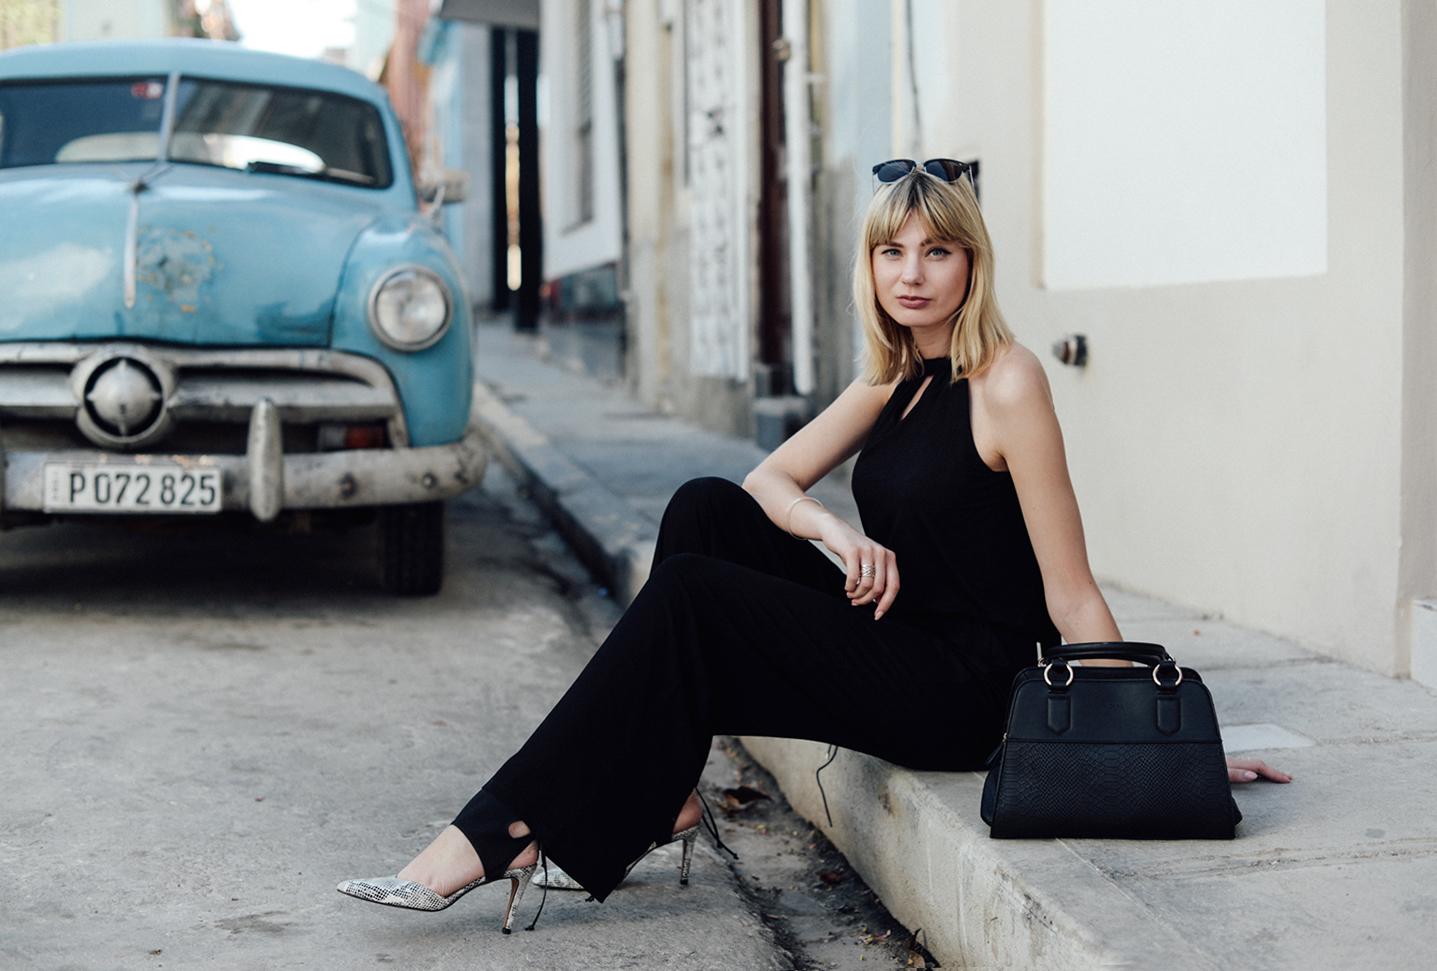 Kiamisu_Modeblog_Fashionblog_Alba Moda_Jumpsuit_Havanna_La Haban Vieja_Kuba Outfit-final2